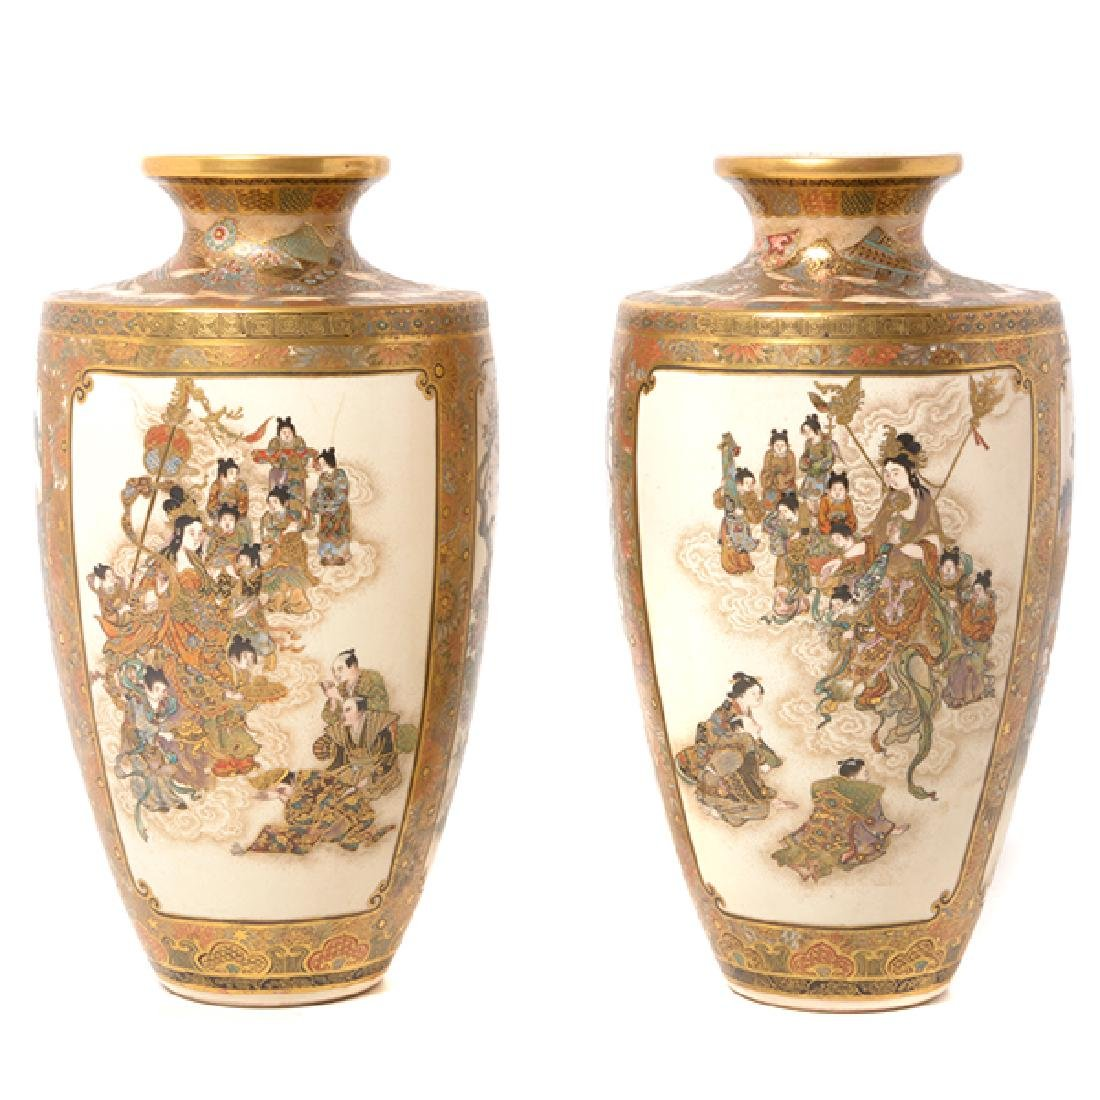 A Pair of Satsuma Vases By Okamoto Ryozan, Meiji Period